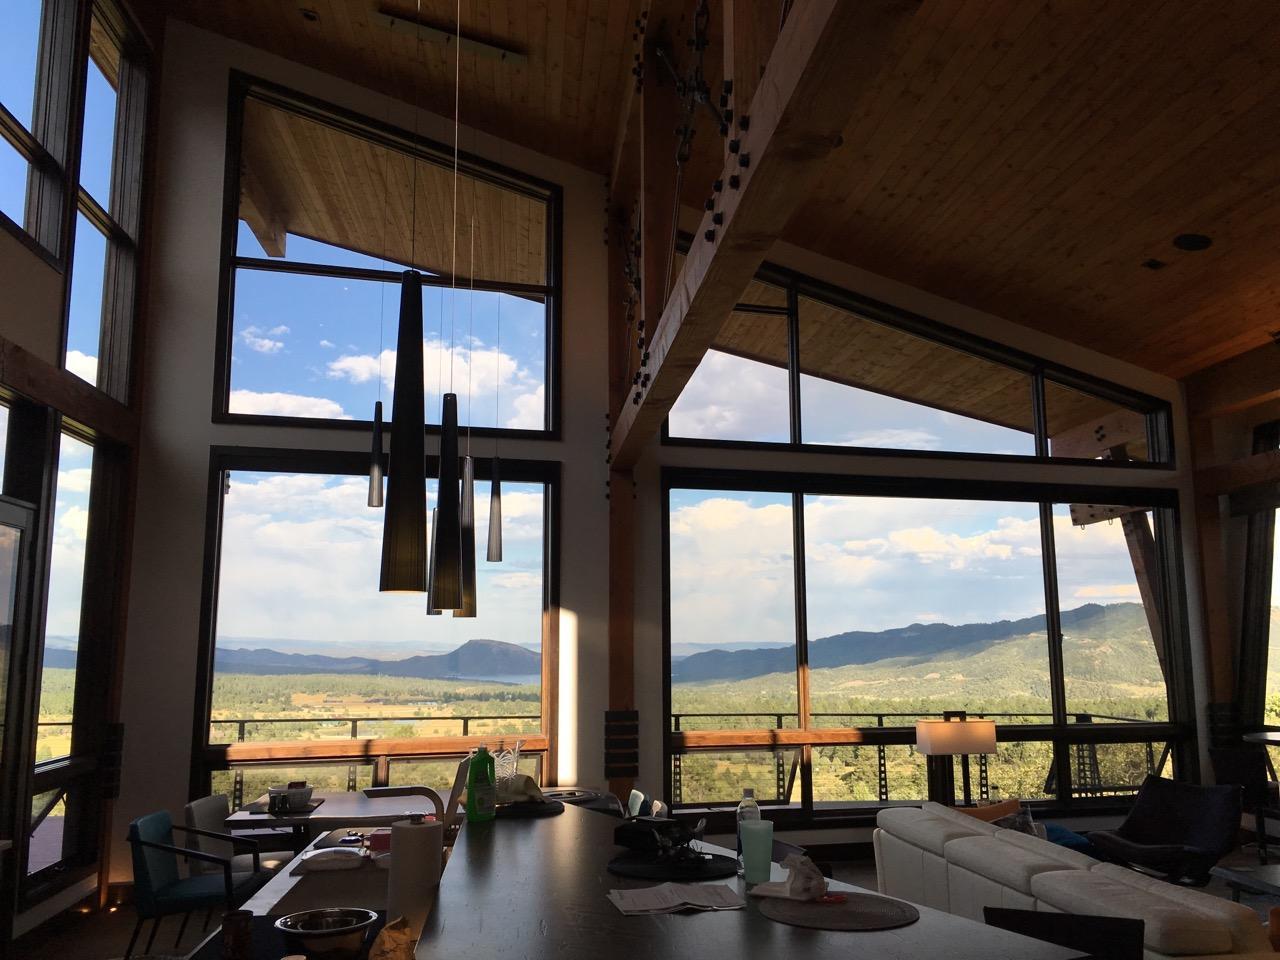 Duralite 40 Home Window Tinting in Durango